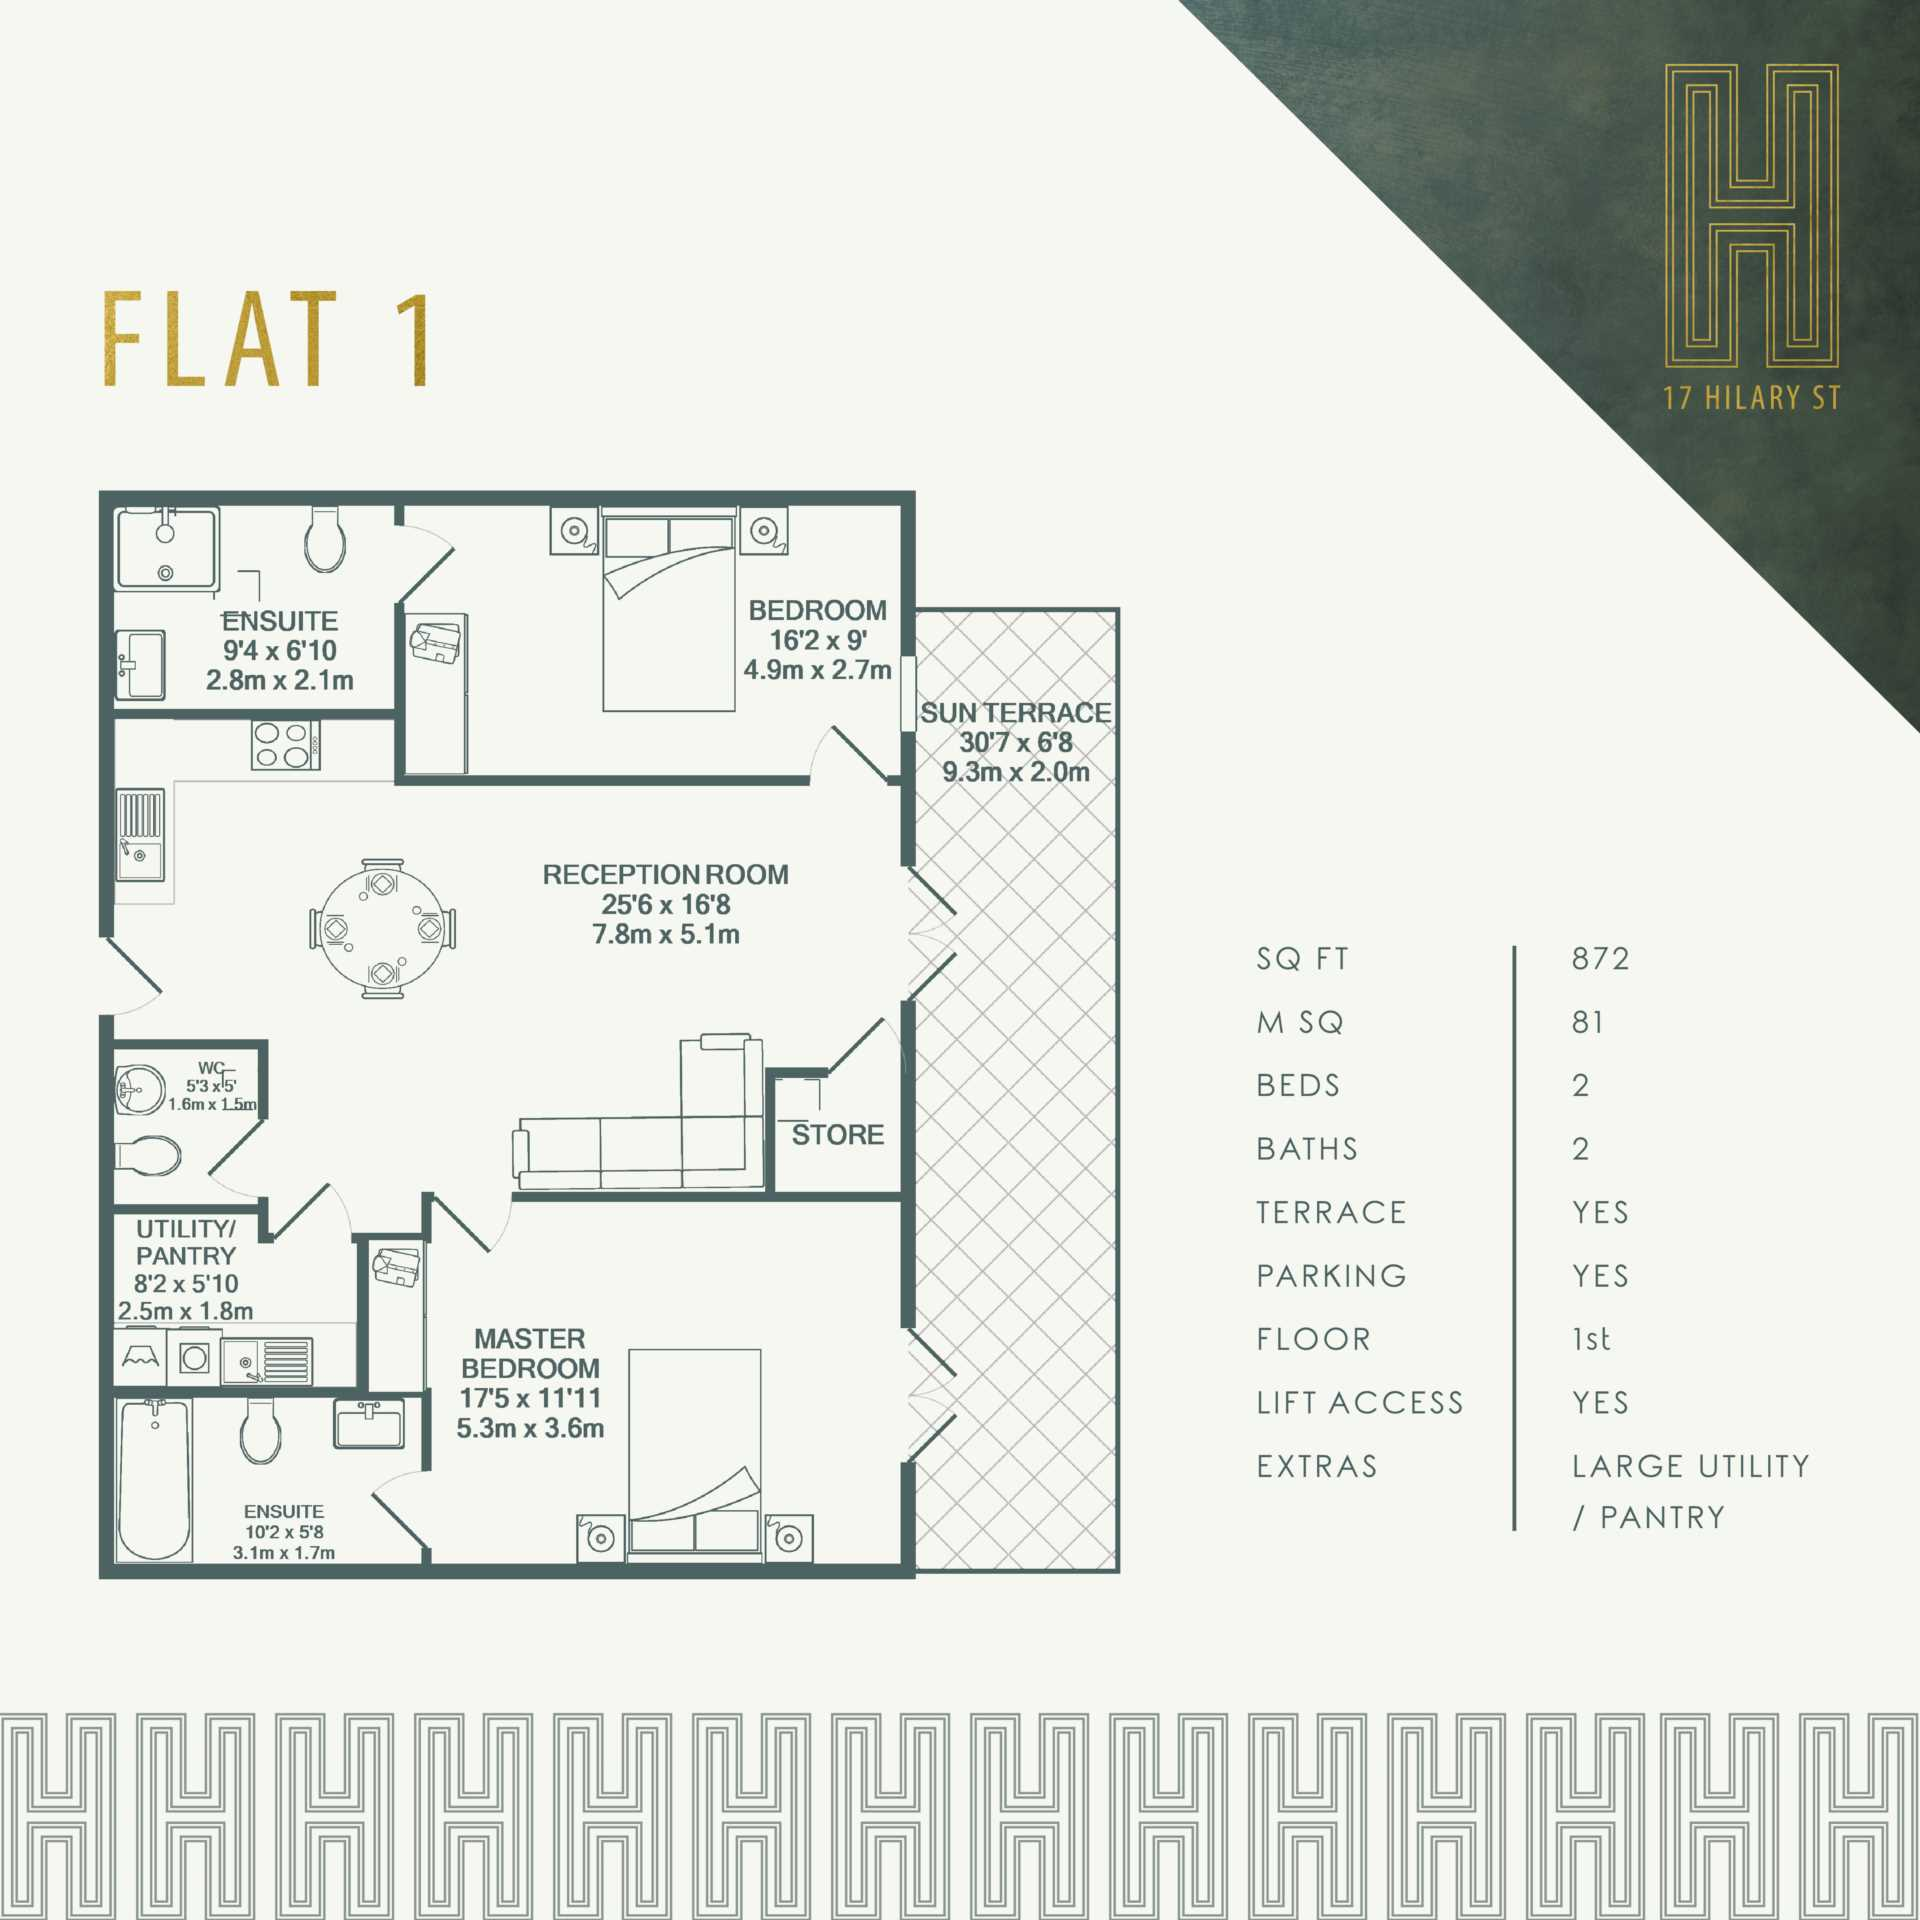 Flat 8, 17 Hilary Street, Image 3